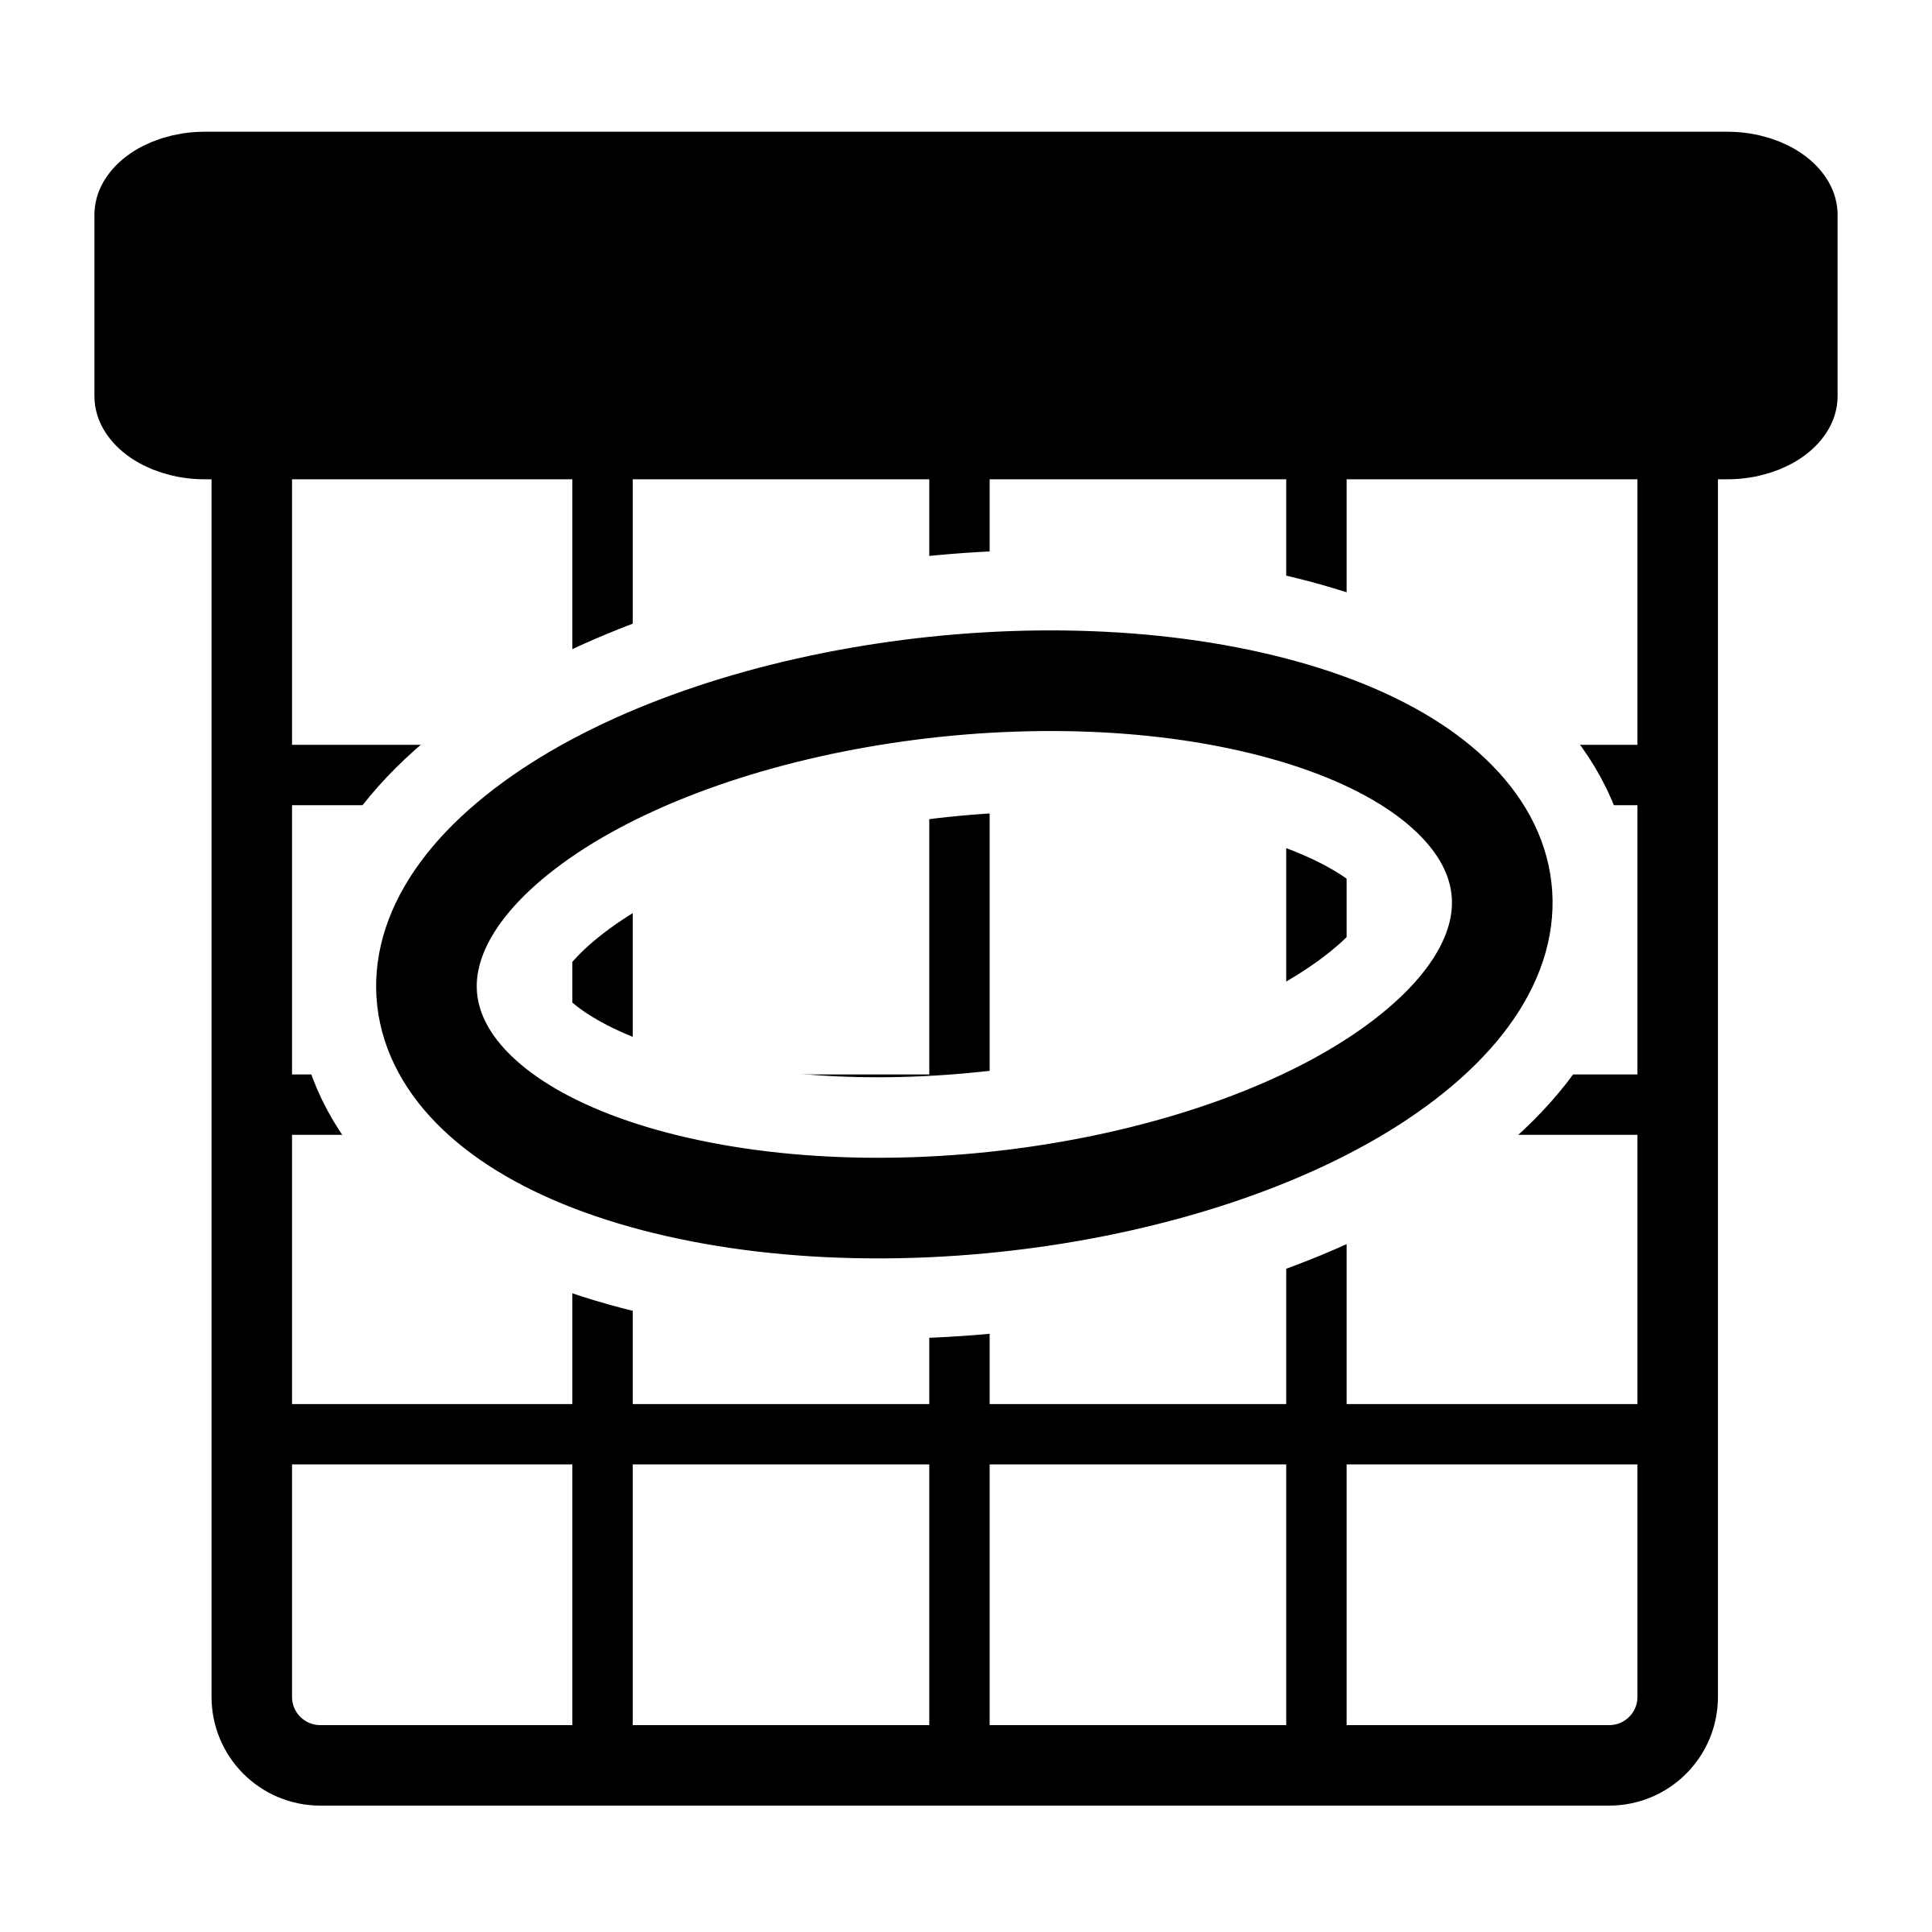 image library download Super idea mono cilpart. Schedule clipart.